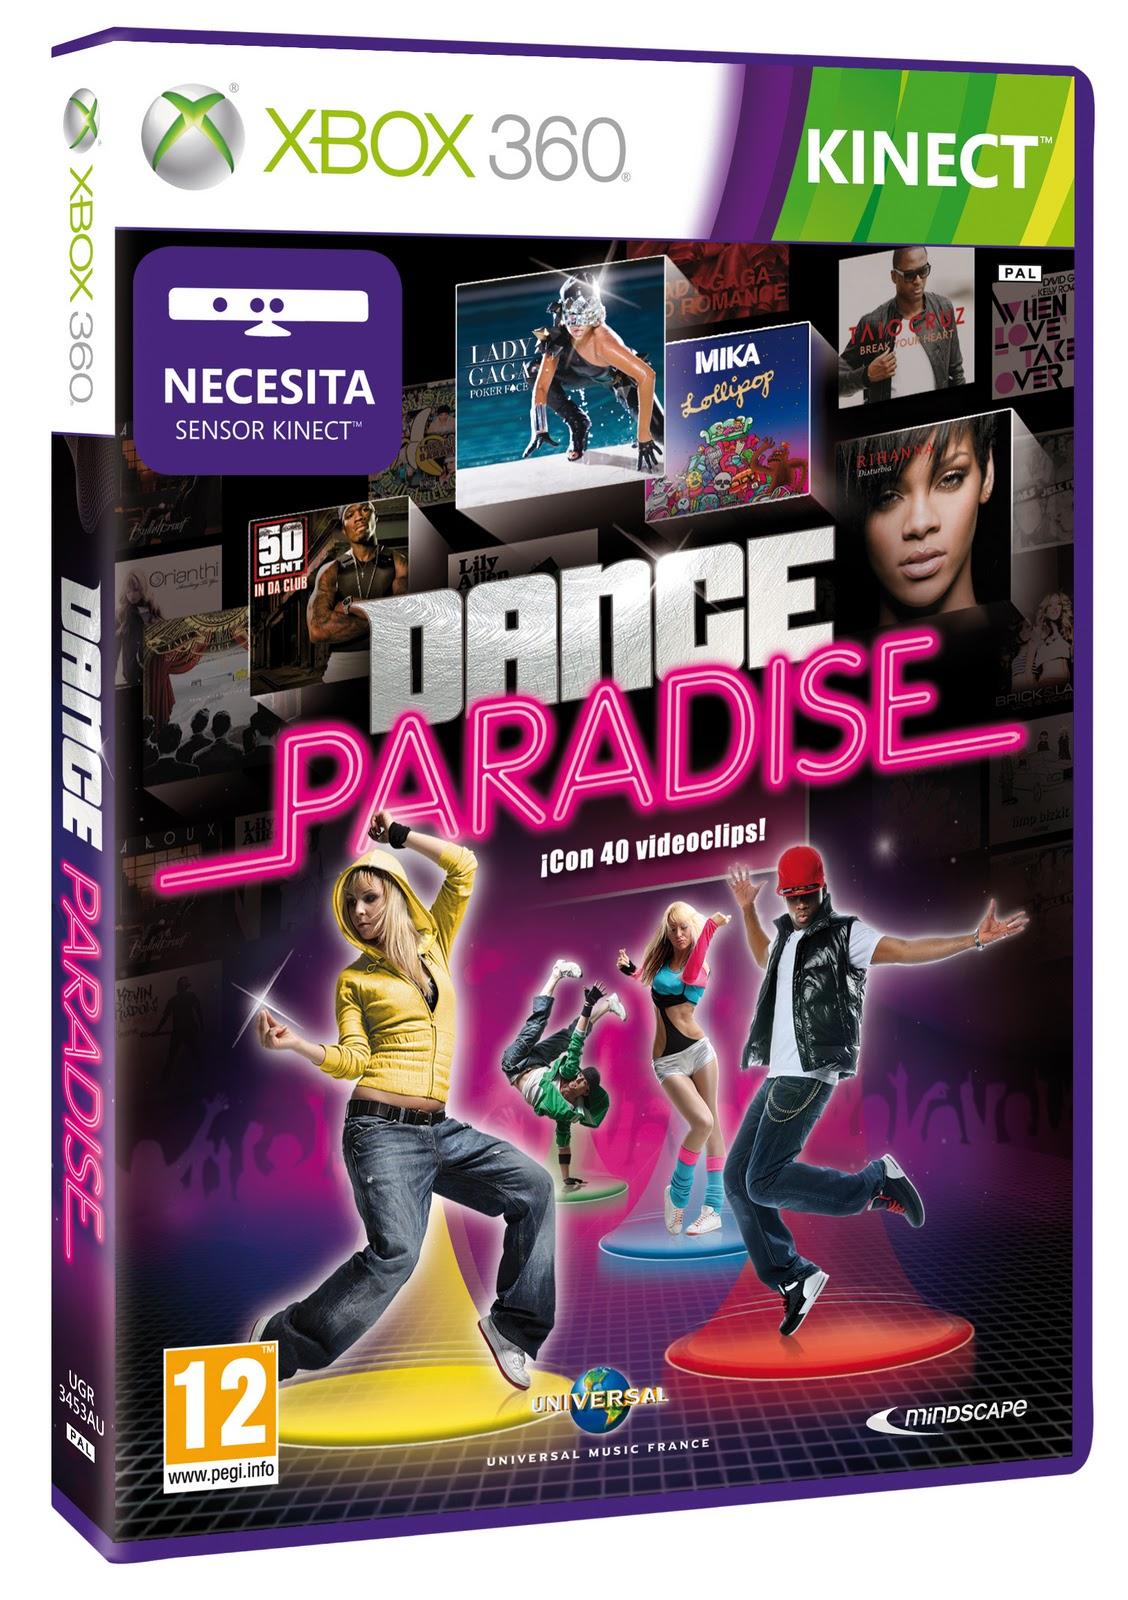 Dance Paradise Para Kinect En Xbox 360 Convertira El Salon De Tu